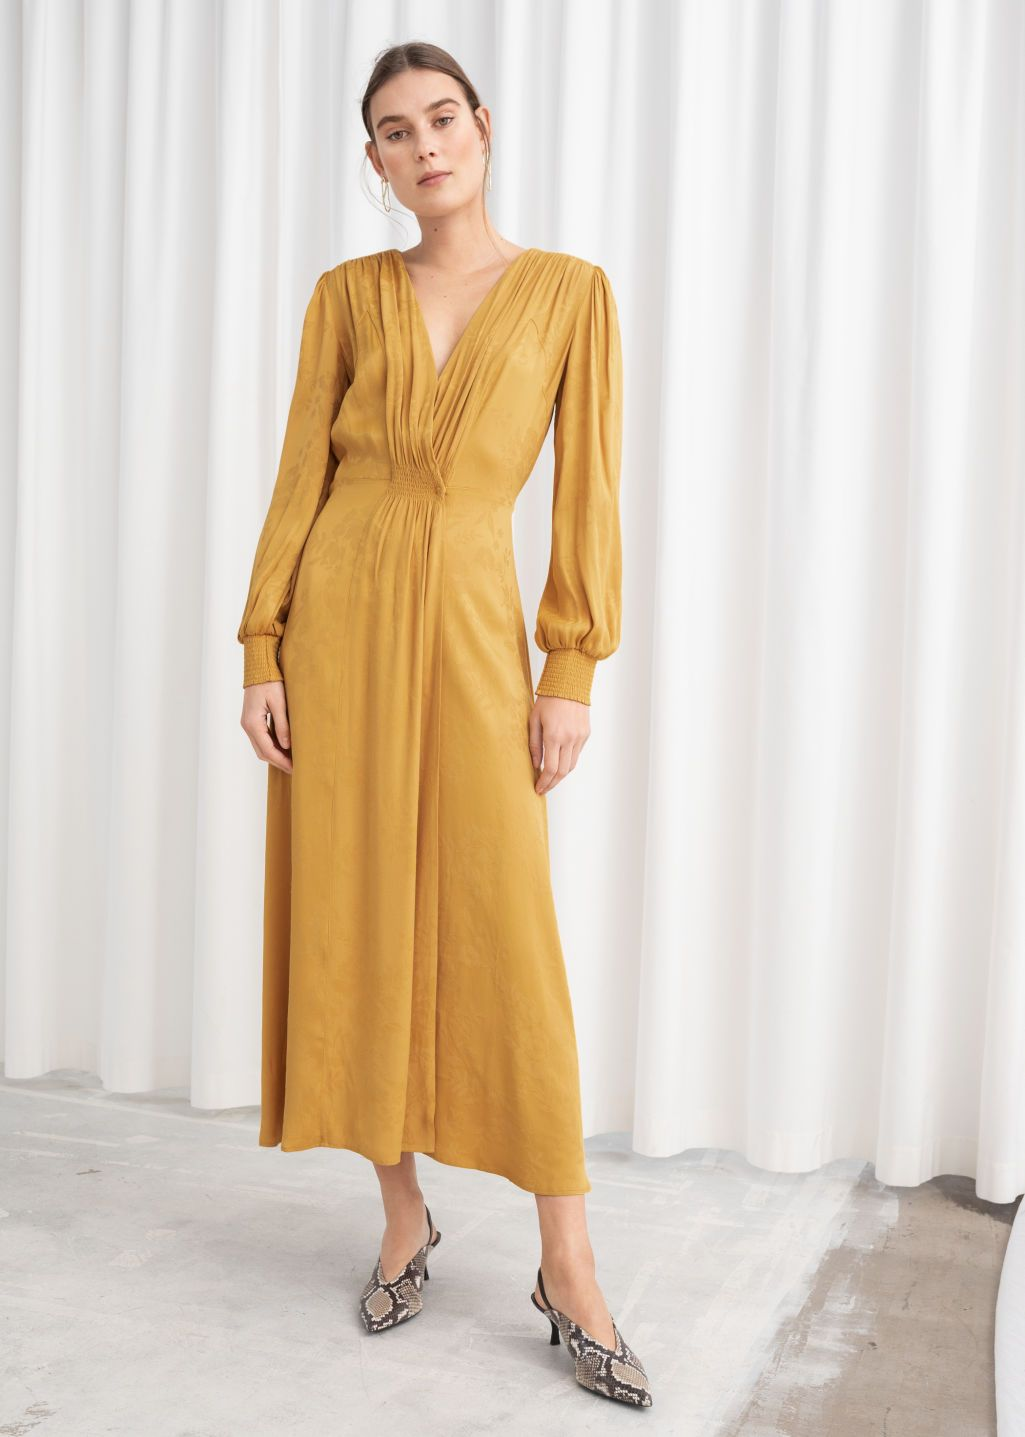 Ruched Jacquard Midi Dress Yellow Midi Dresses Other Stories Midi Dress Dresses Fashion